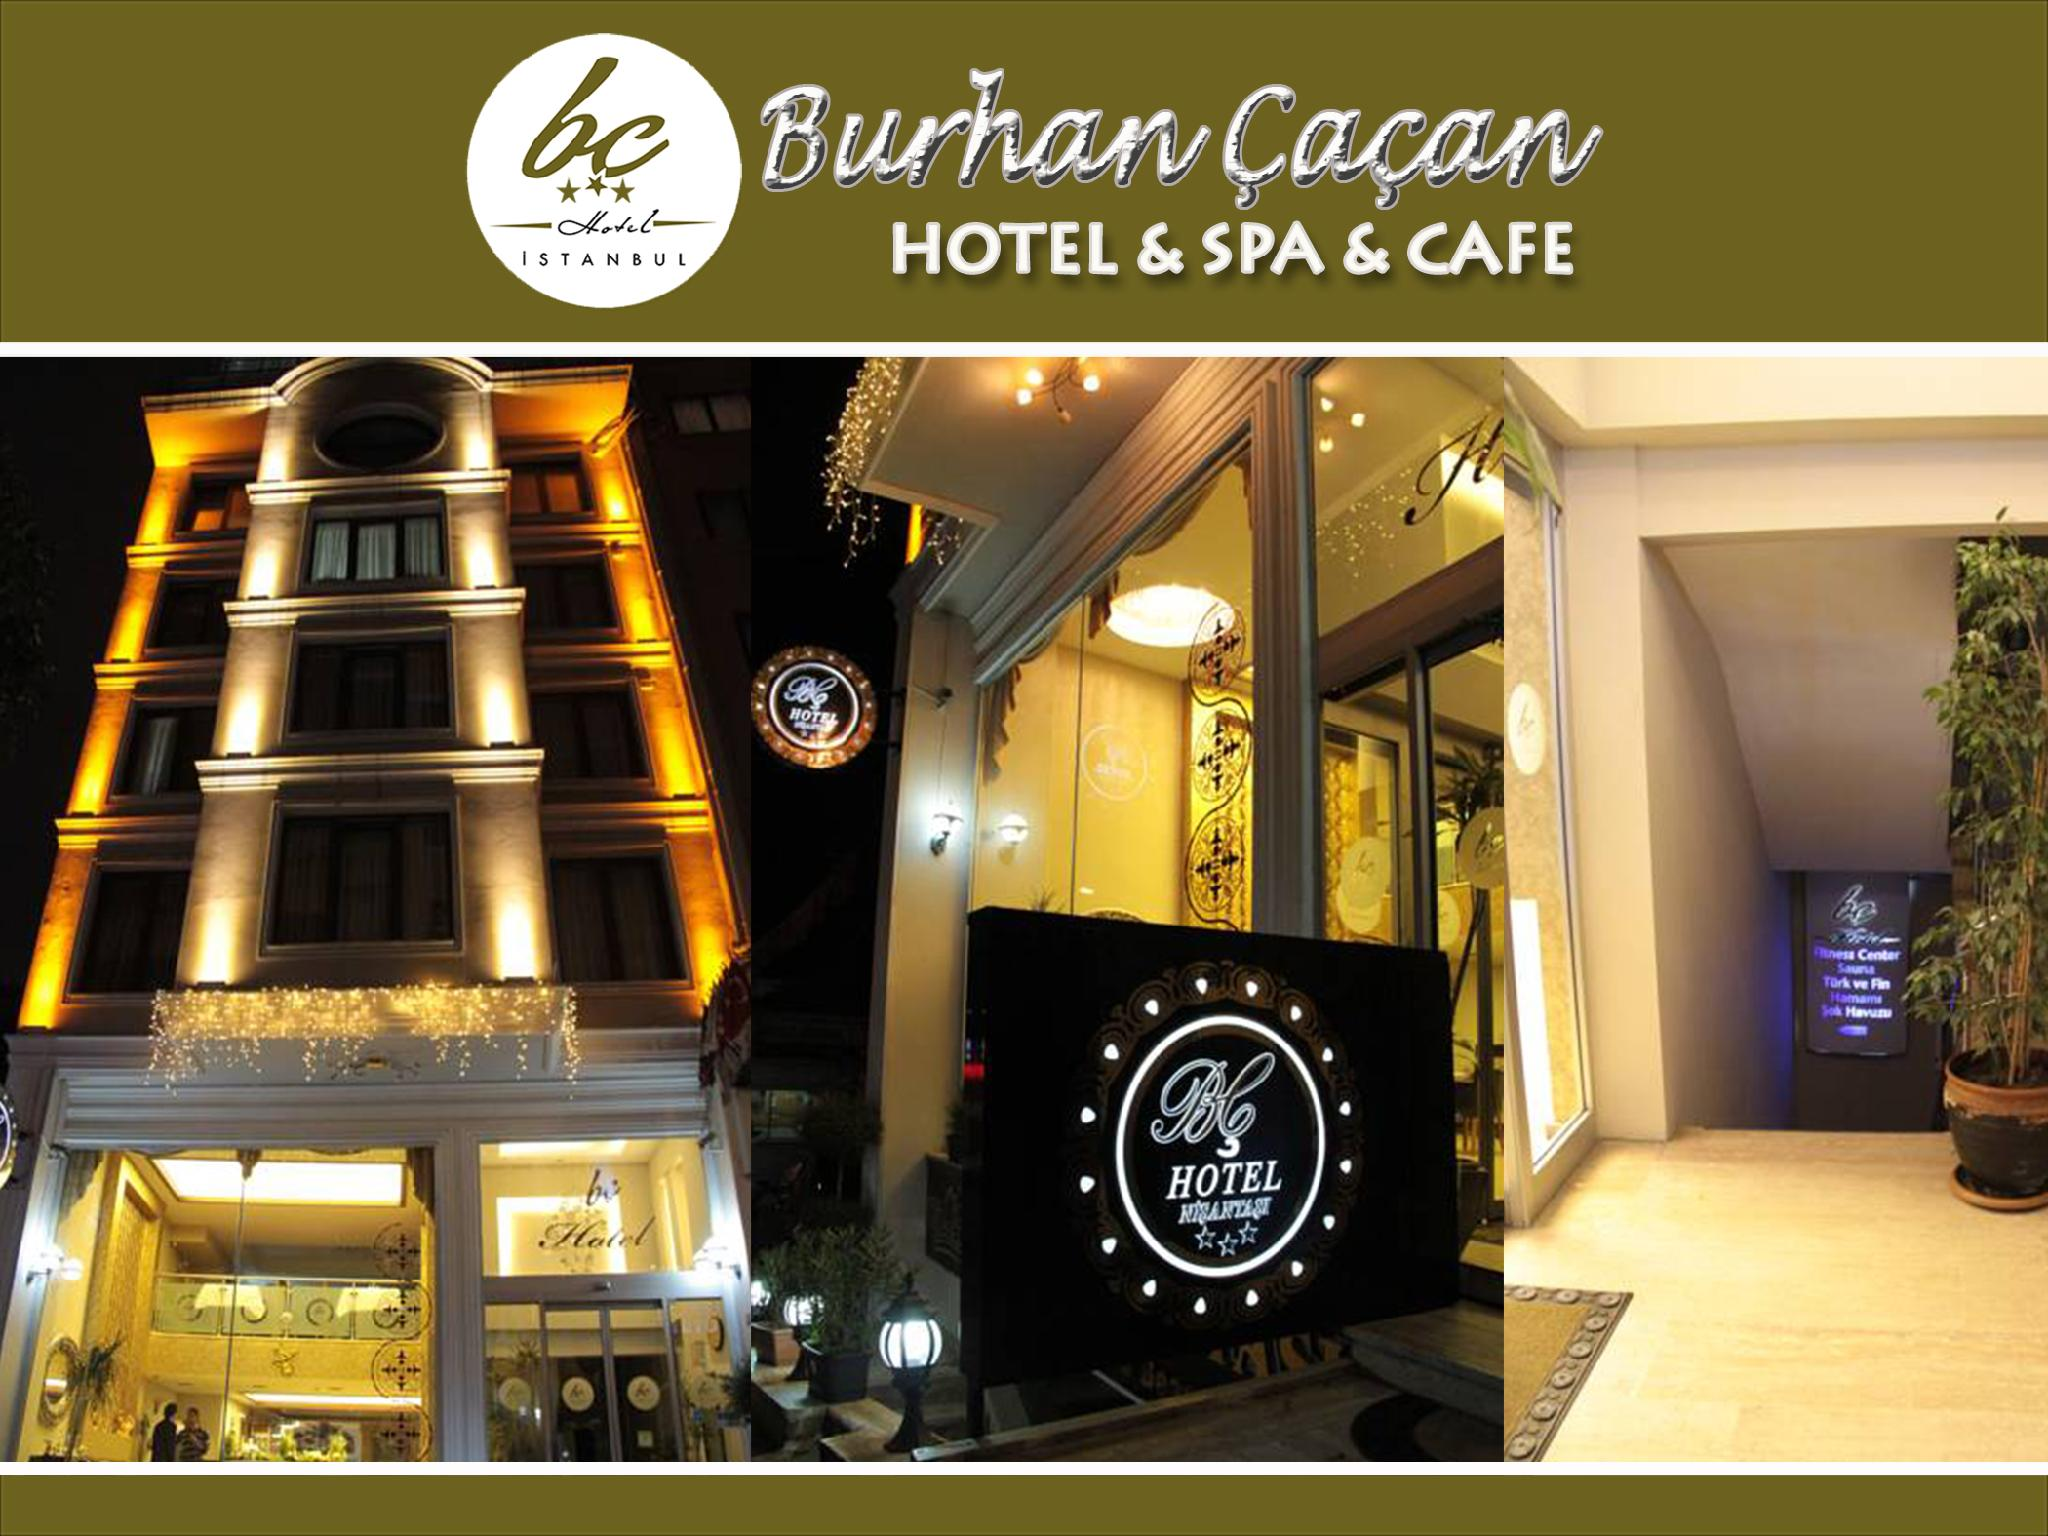 BC Burhan Cacan Hotel